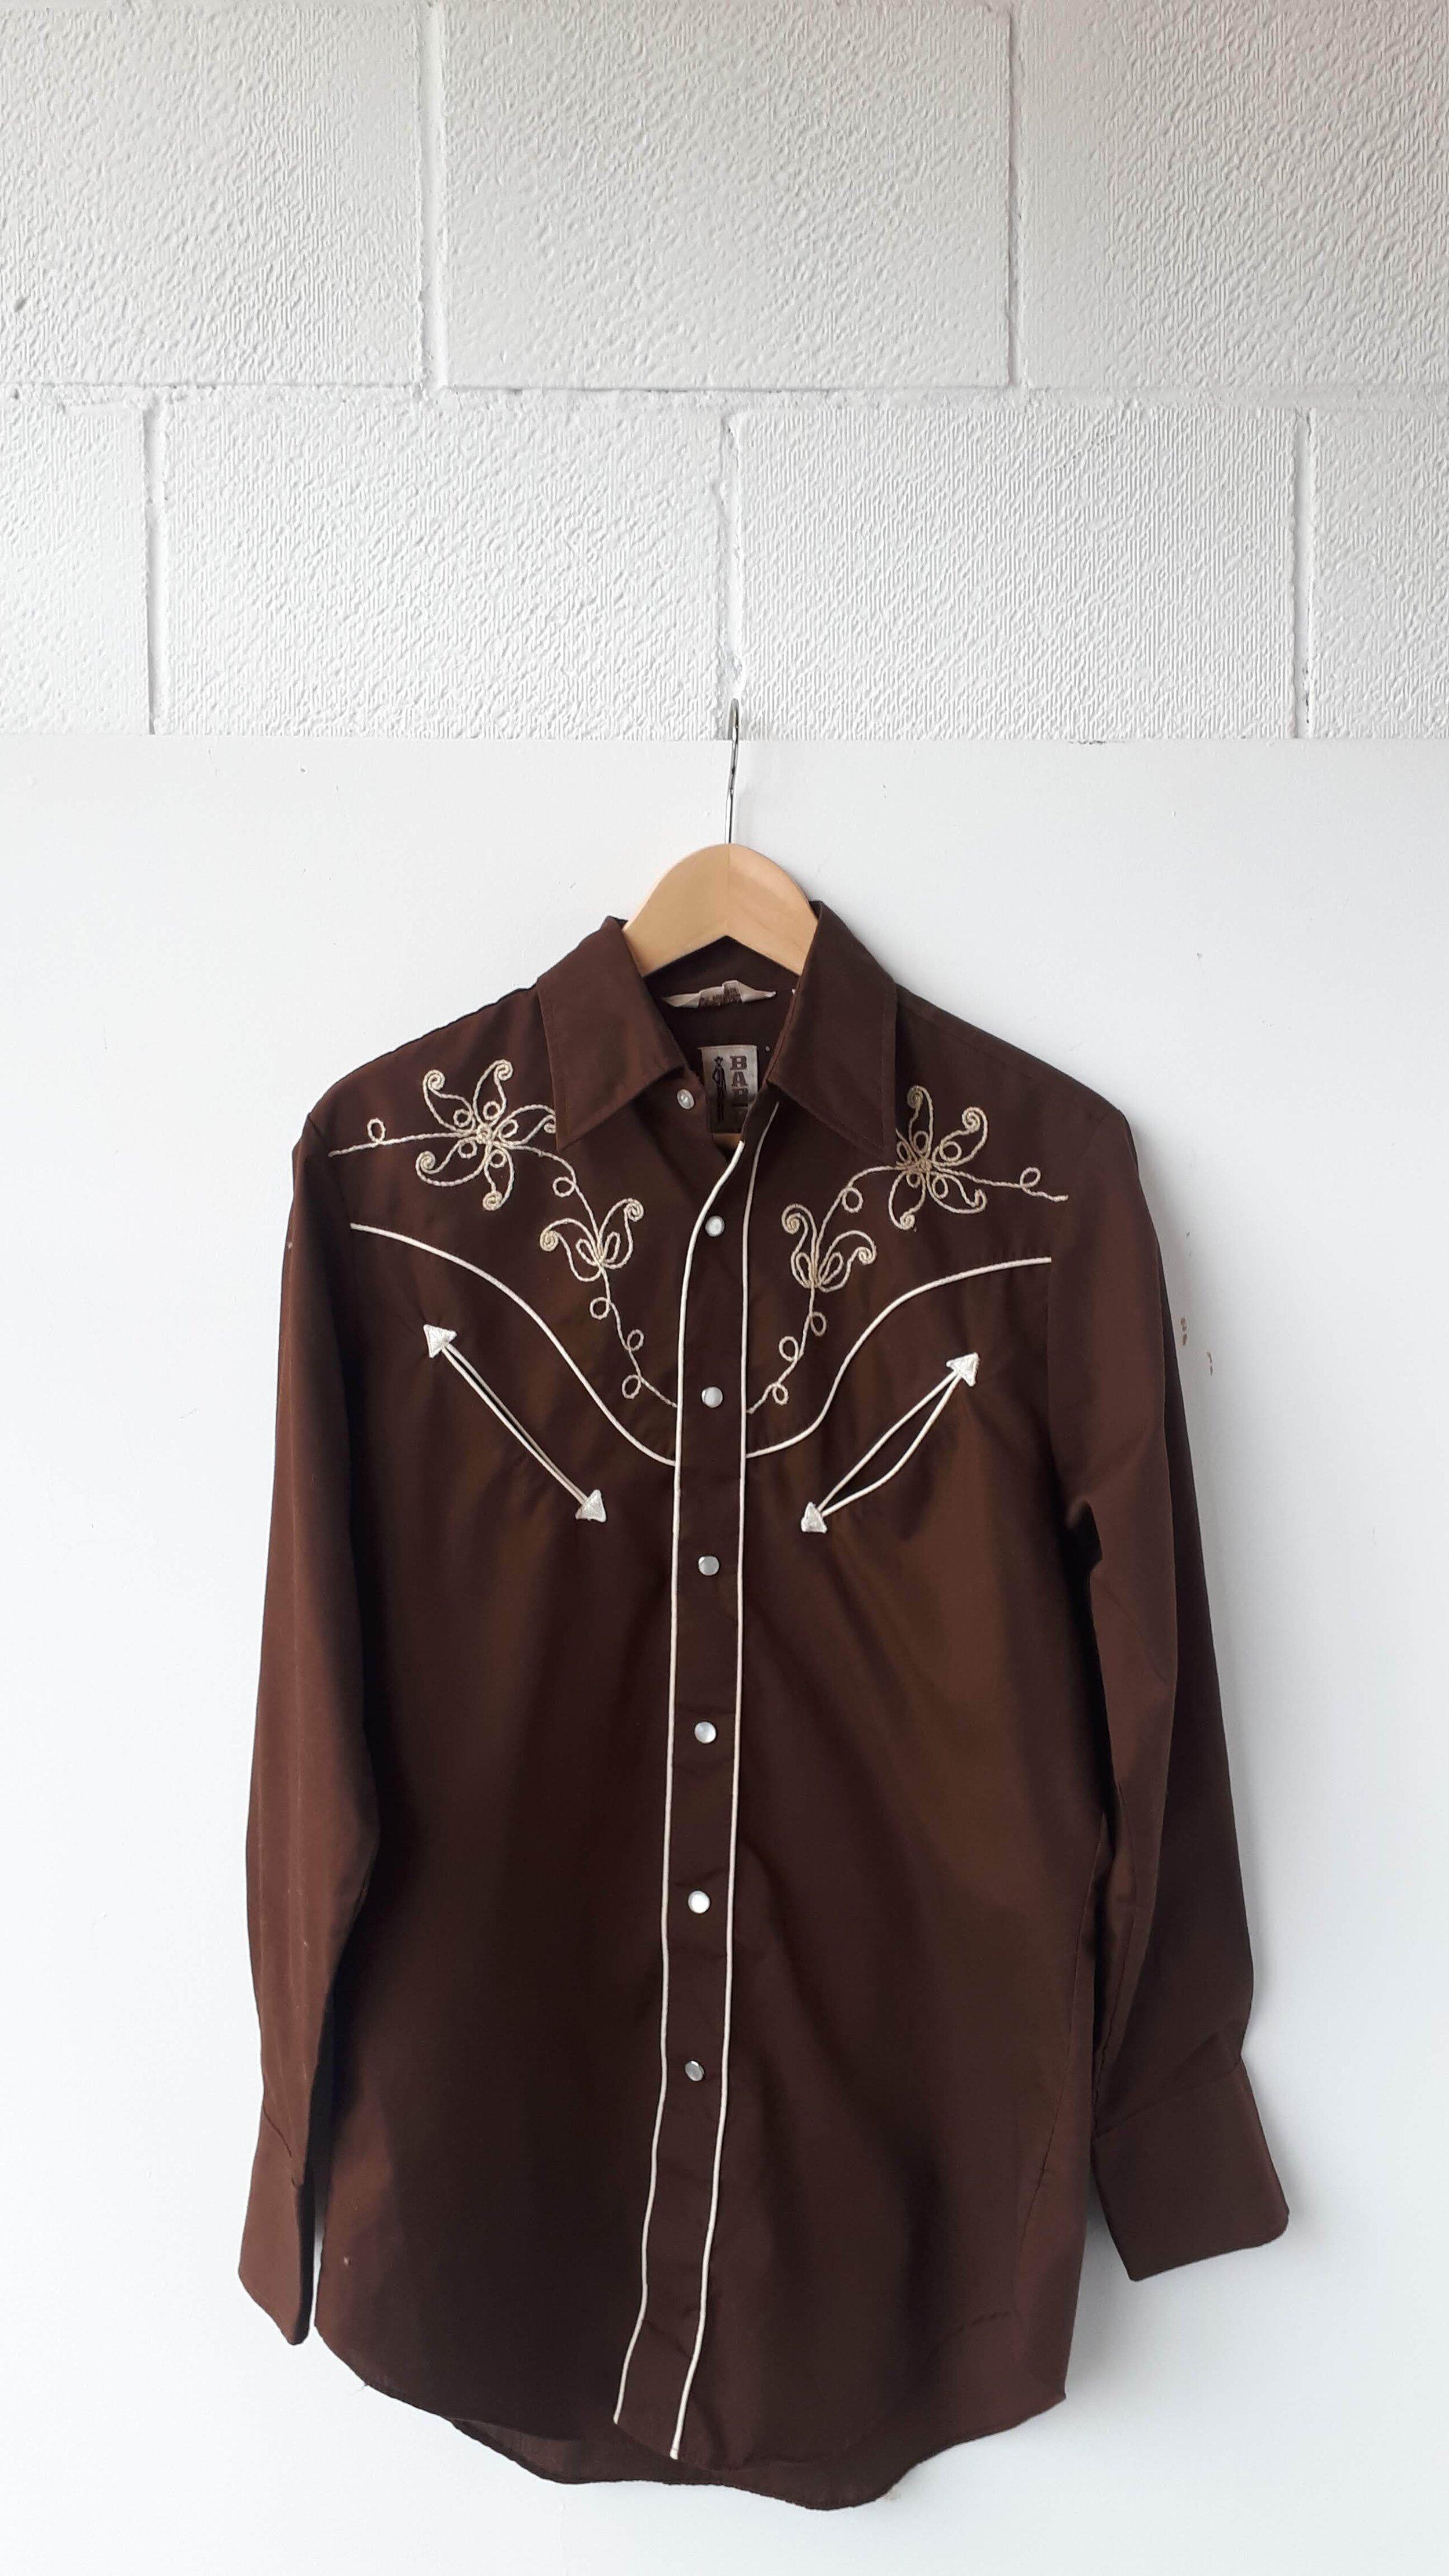 Barb shirt; Men's size M, $28